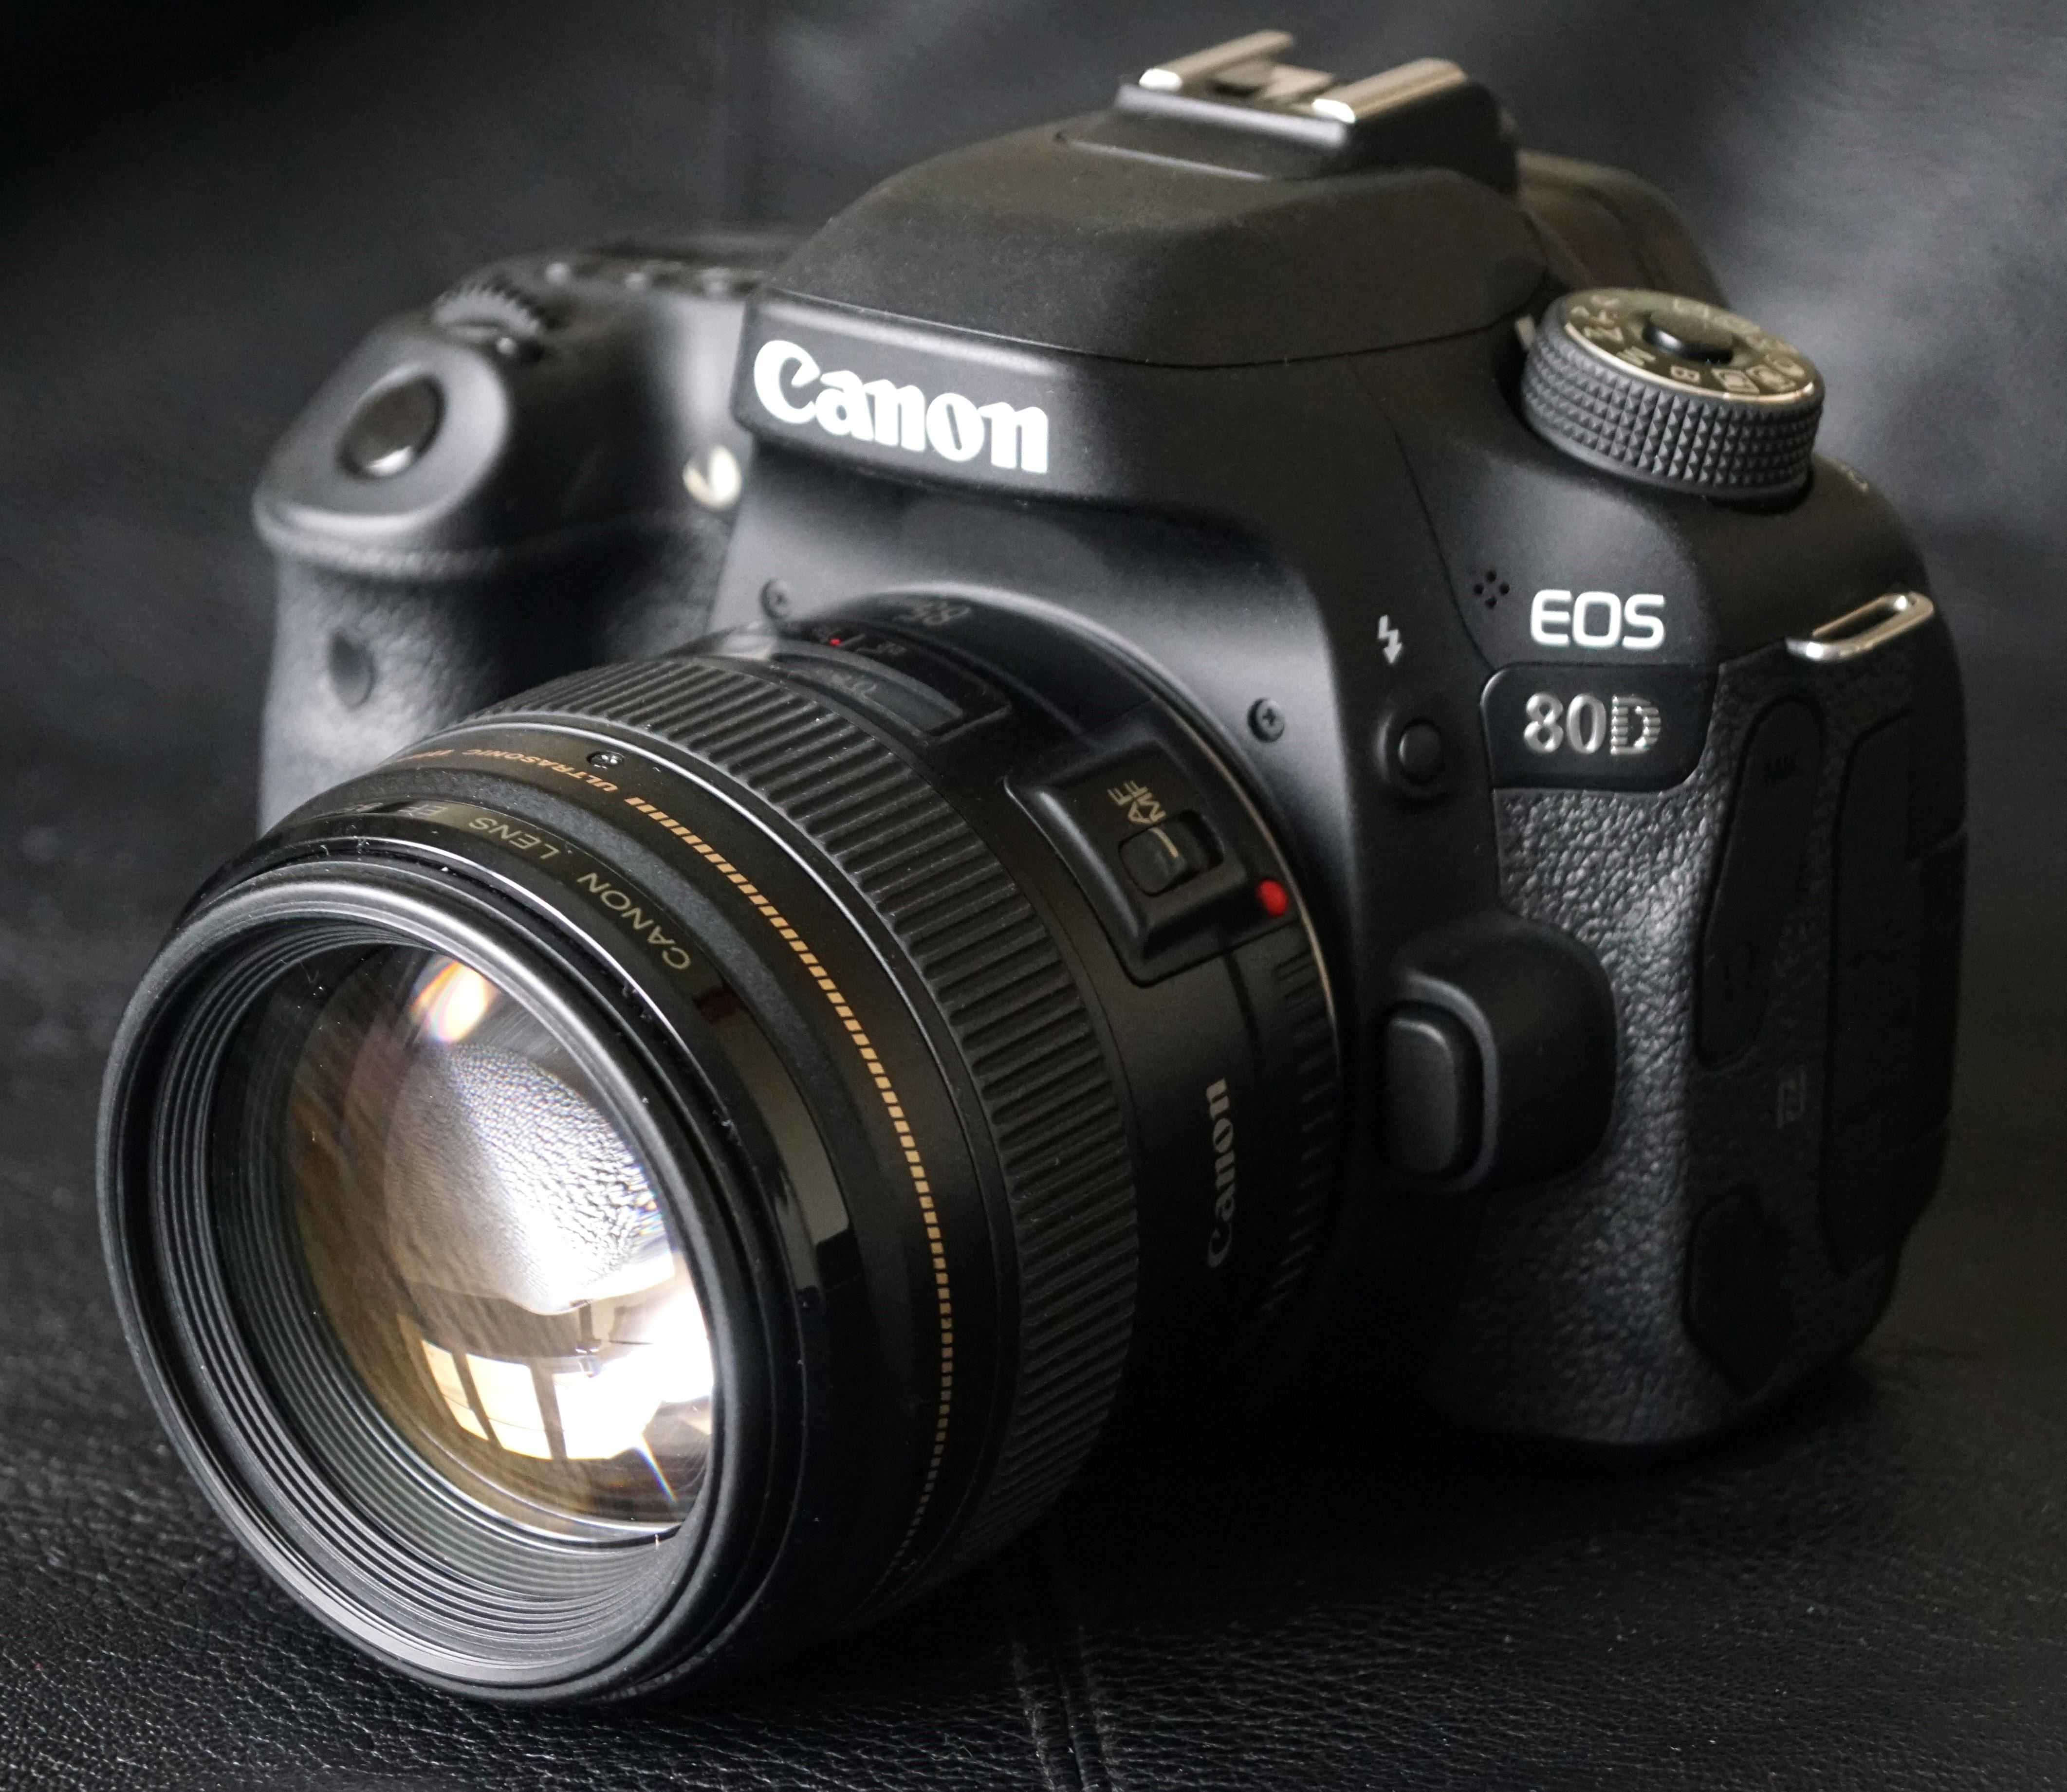 Canon EOS 80D Expert Review | ePHOTOzine